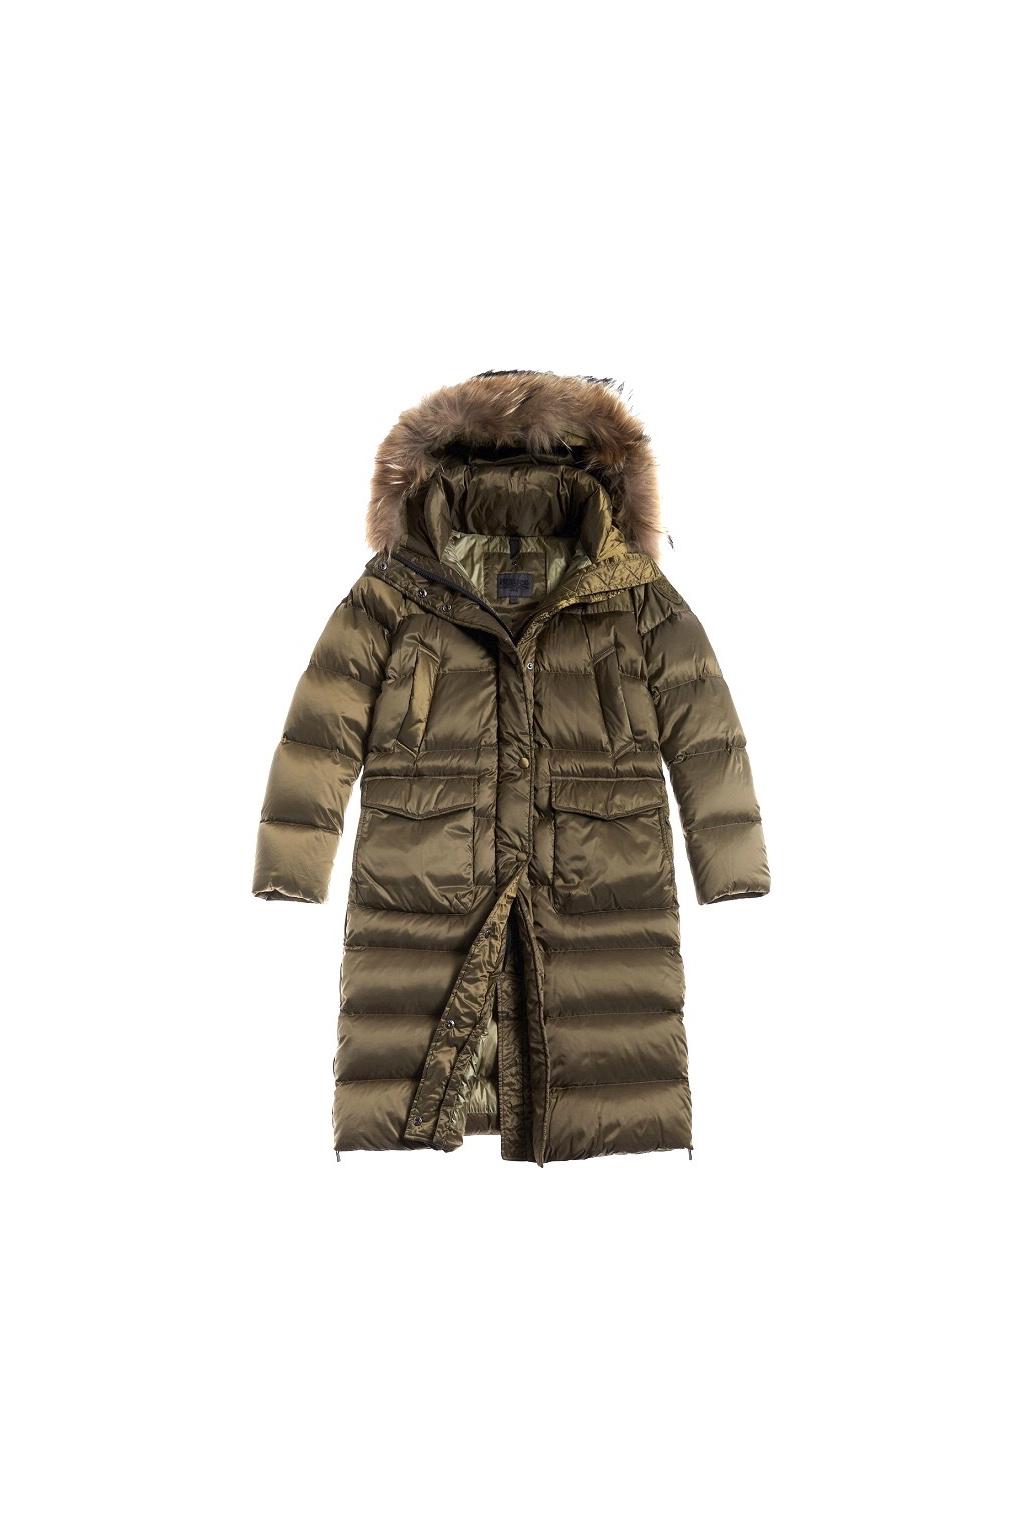 20WBLDK03151 Dámský péřový kabát Blauer zelený